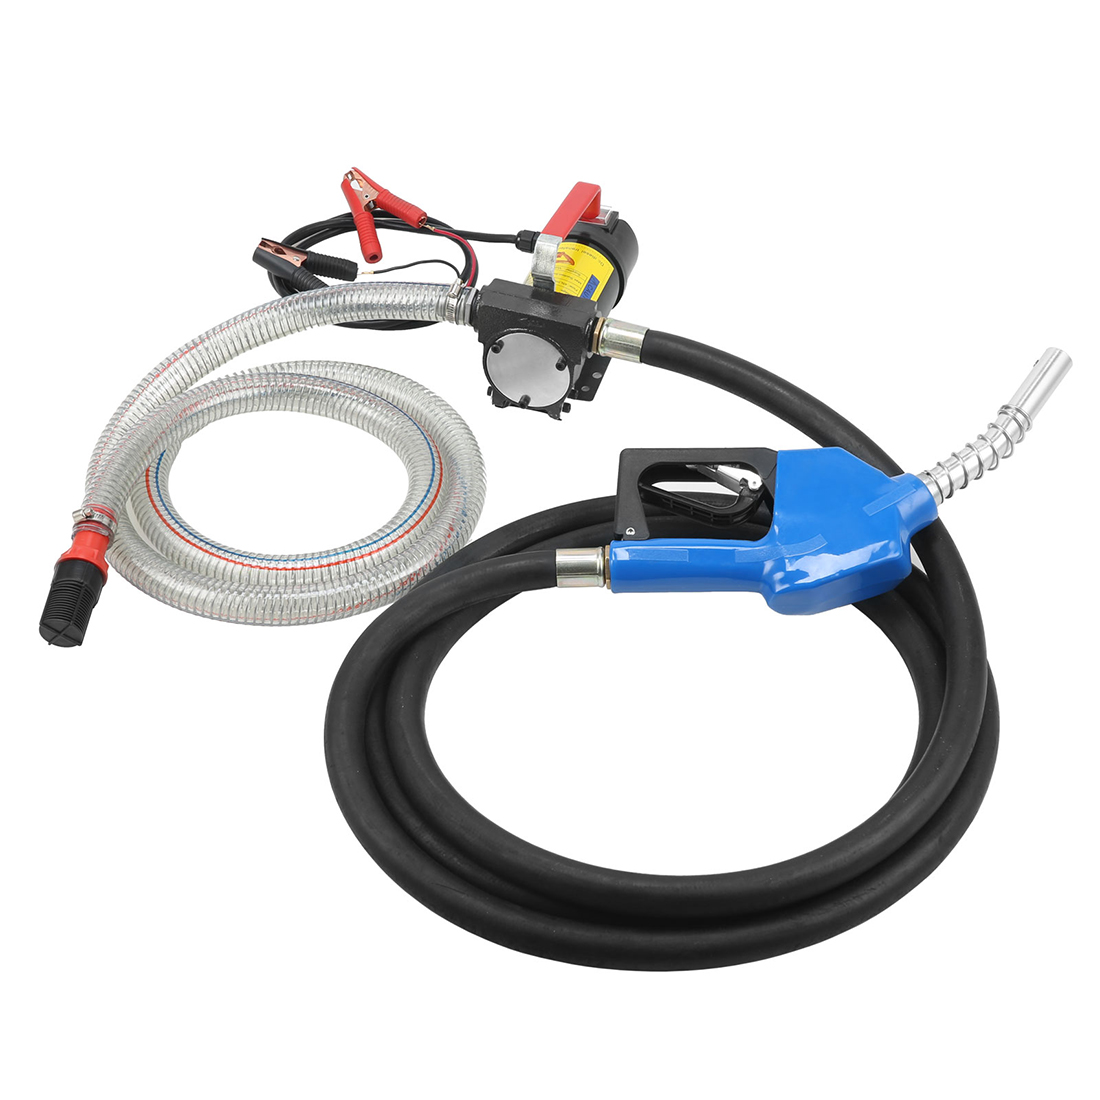 Portable 12V Diesel Fluid Extractor Electric Transfer Pump Car Fuel Auto Speed недорго, оригинальная цена